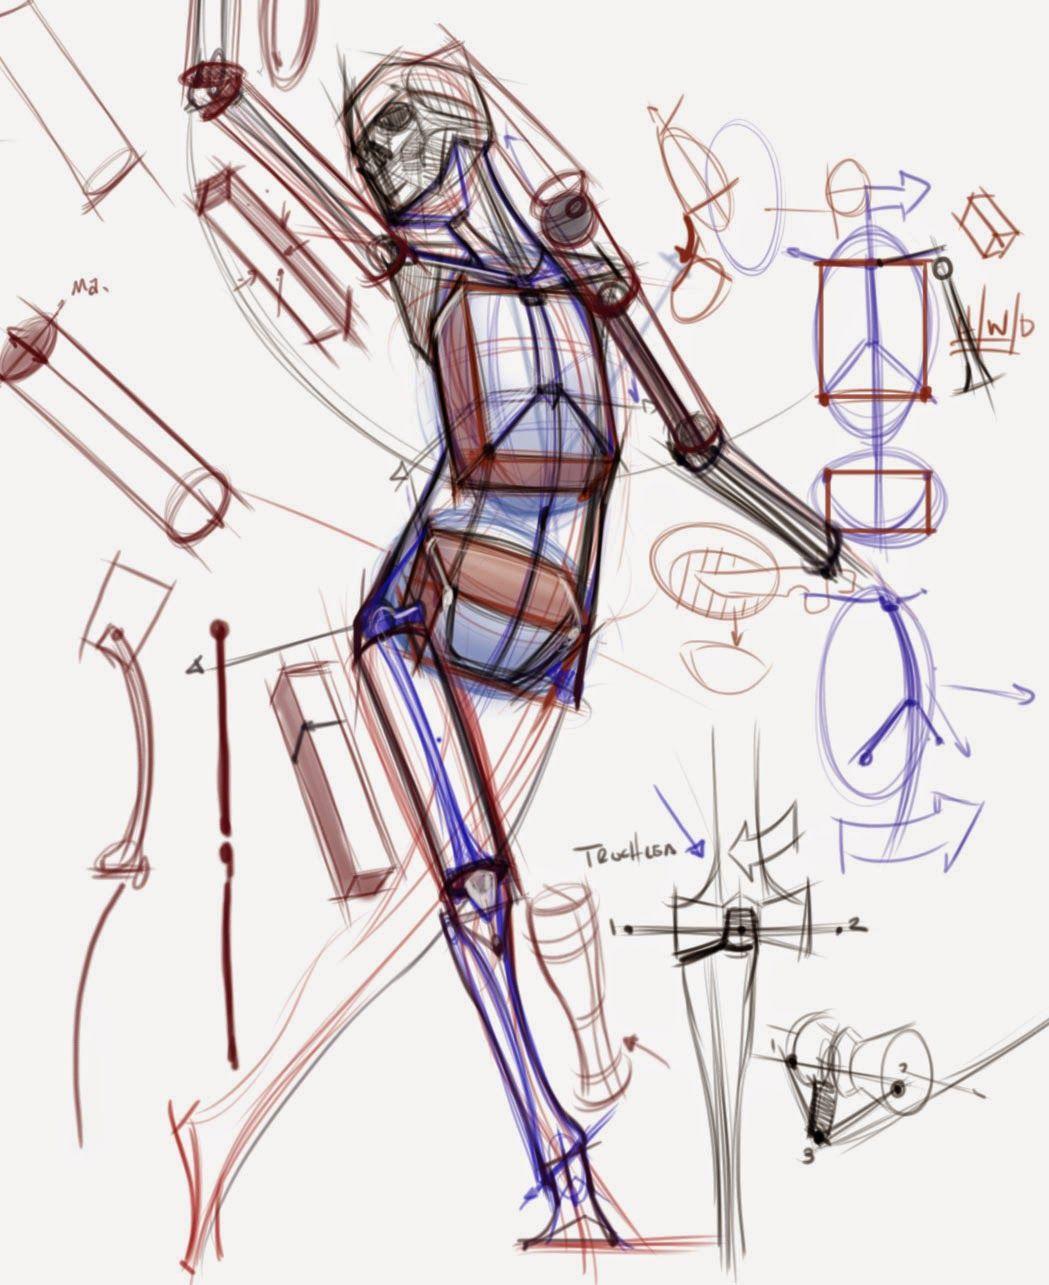 figuredrawing info_news | Life Drawing: Shuchih's Art Studio